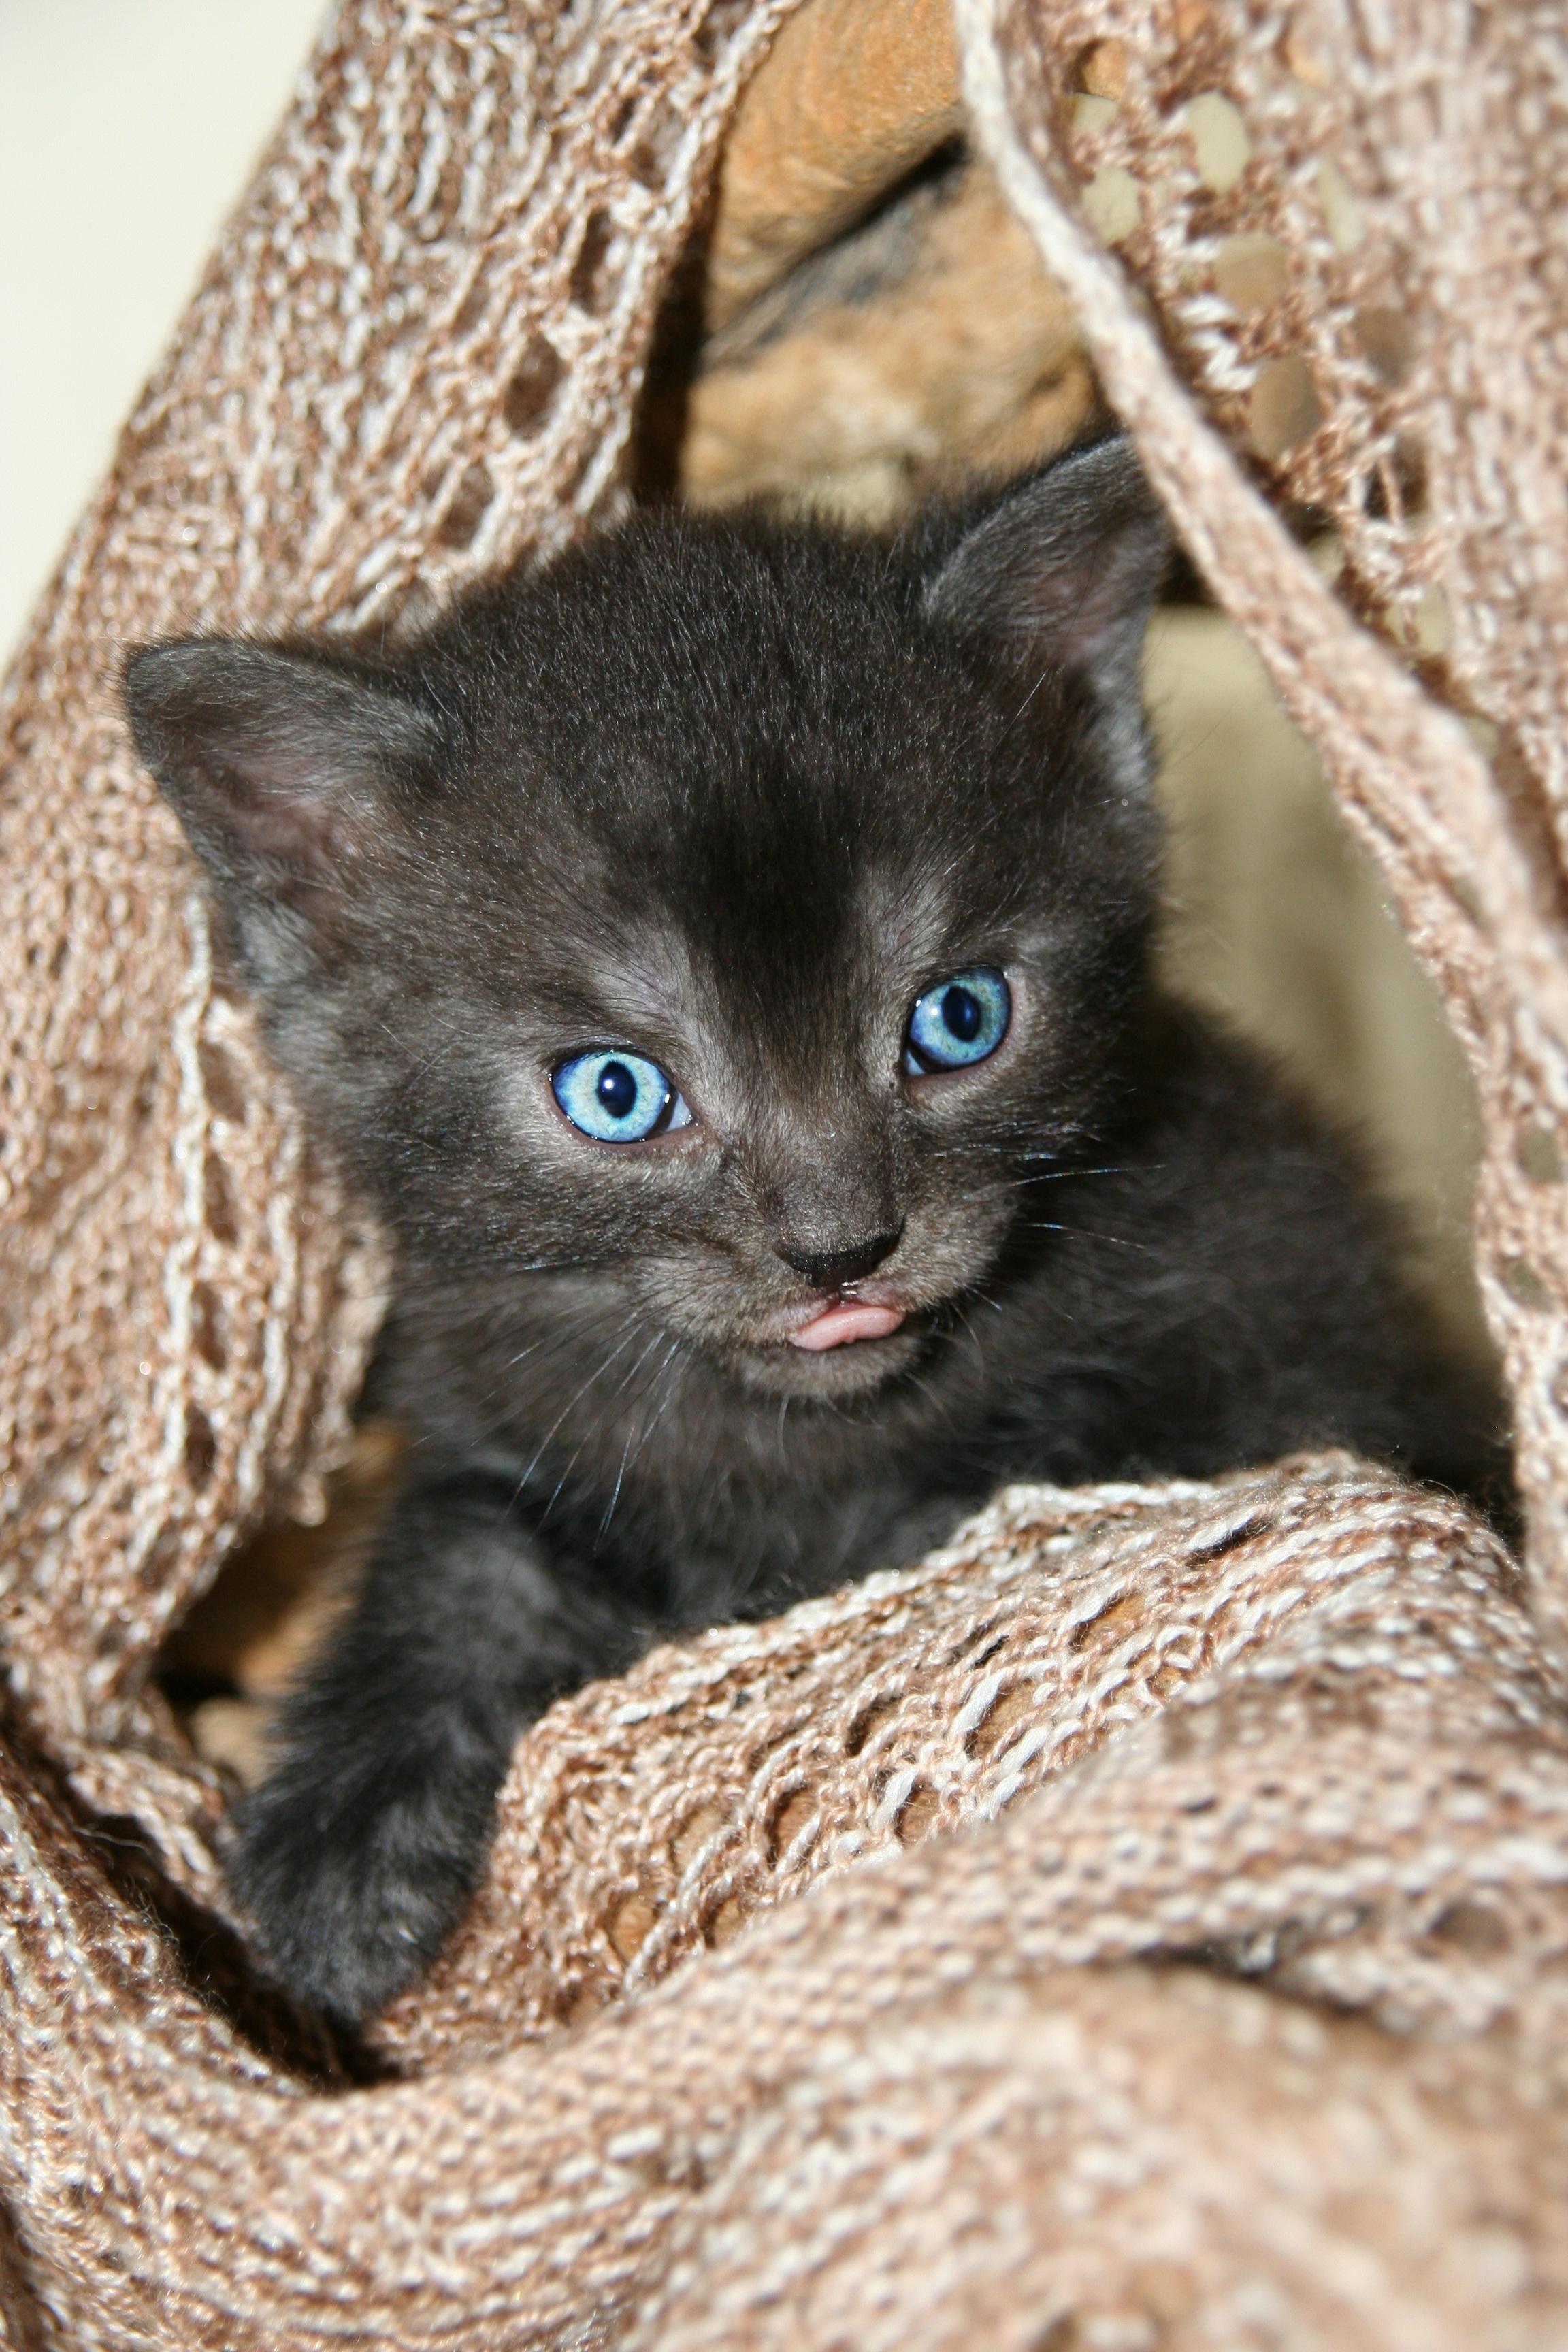 680 Koleksi Gambar Binatang Lidah Kucing Terbaik